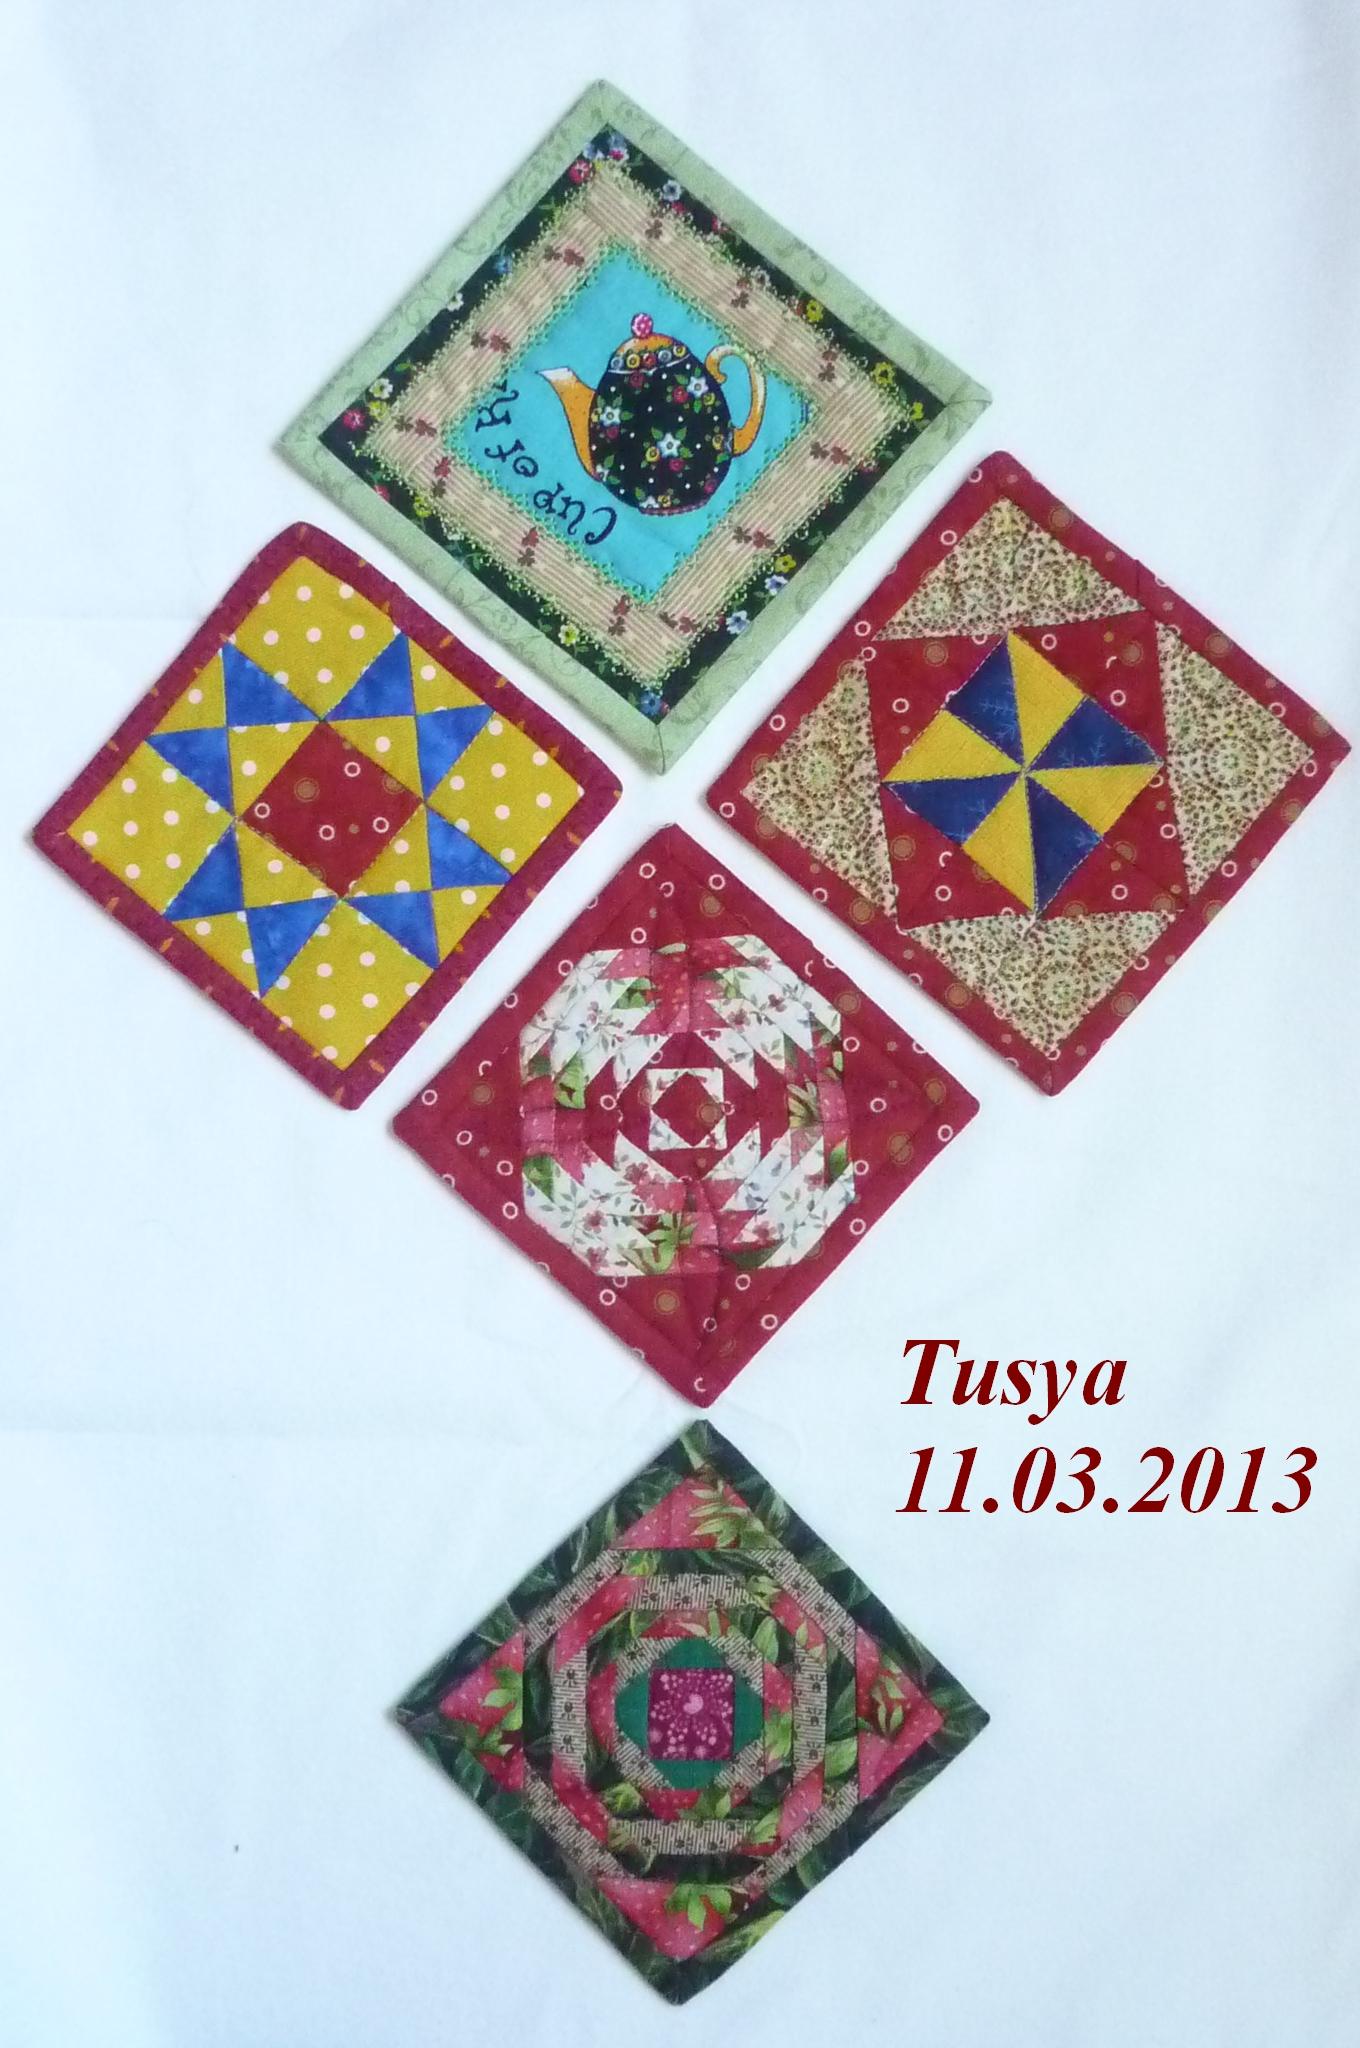 Tusya.jpg